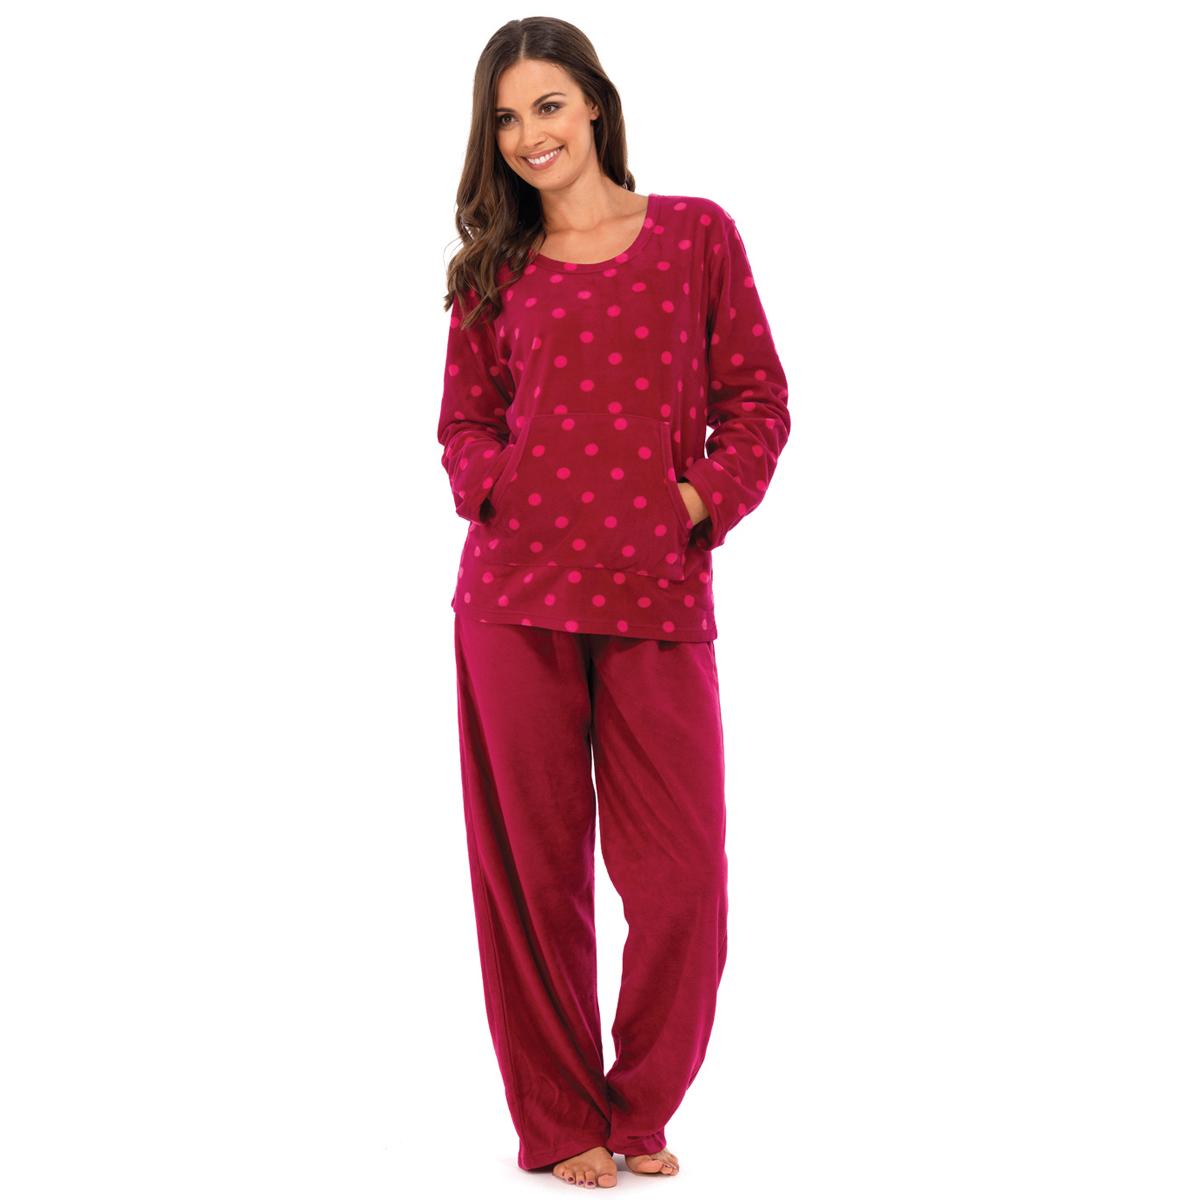 Ladies Womens Long Sleeve Polka Dot Fleece PJ Pyjamas Sets ...